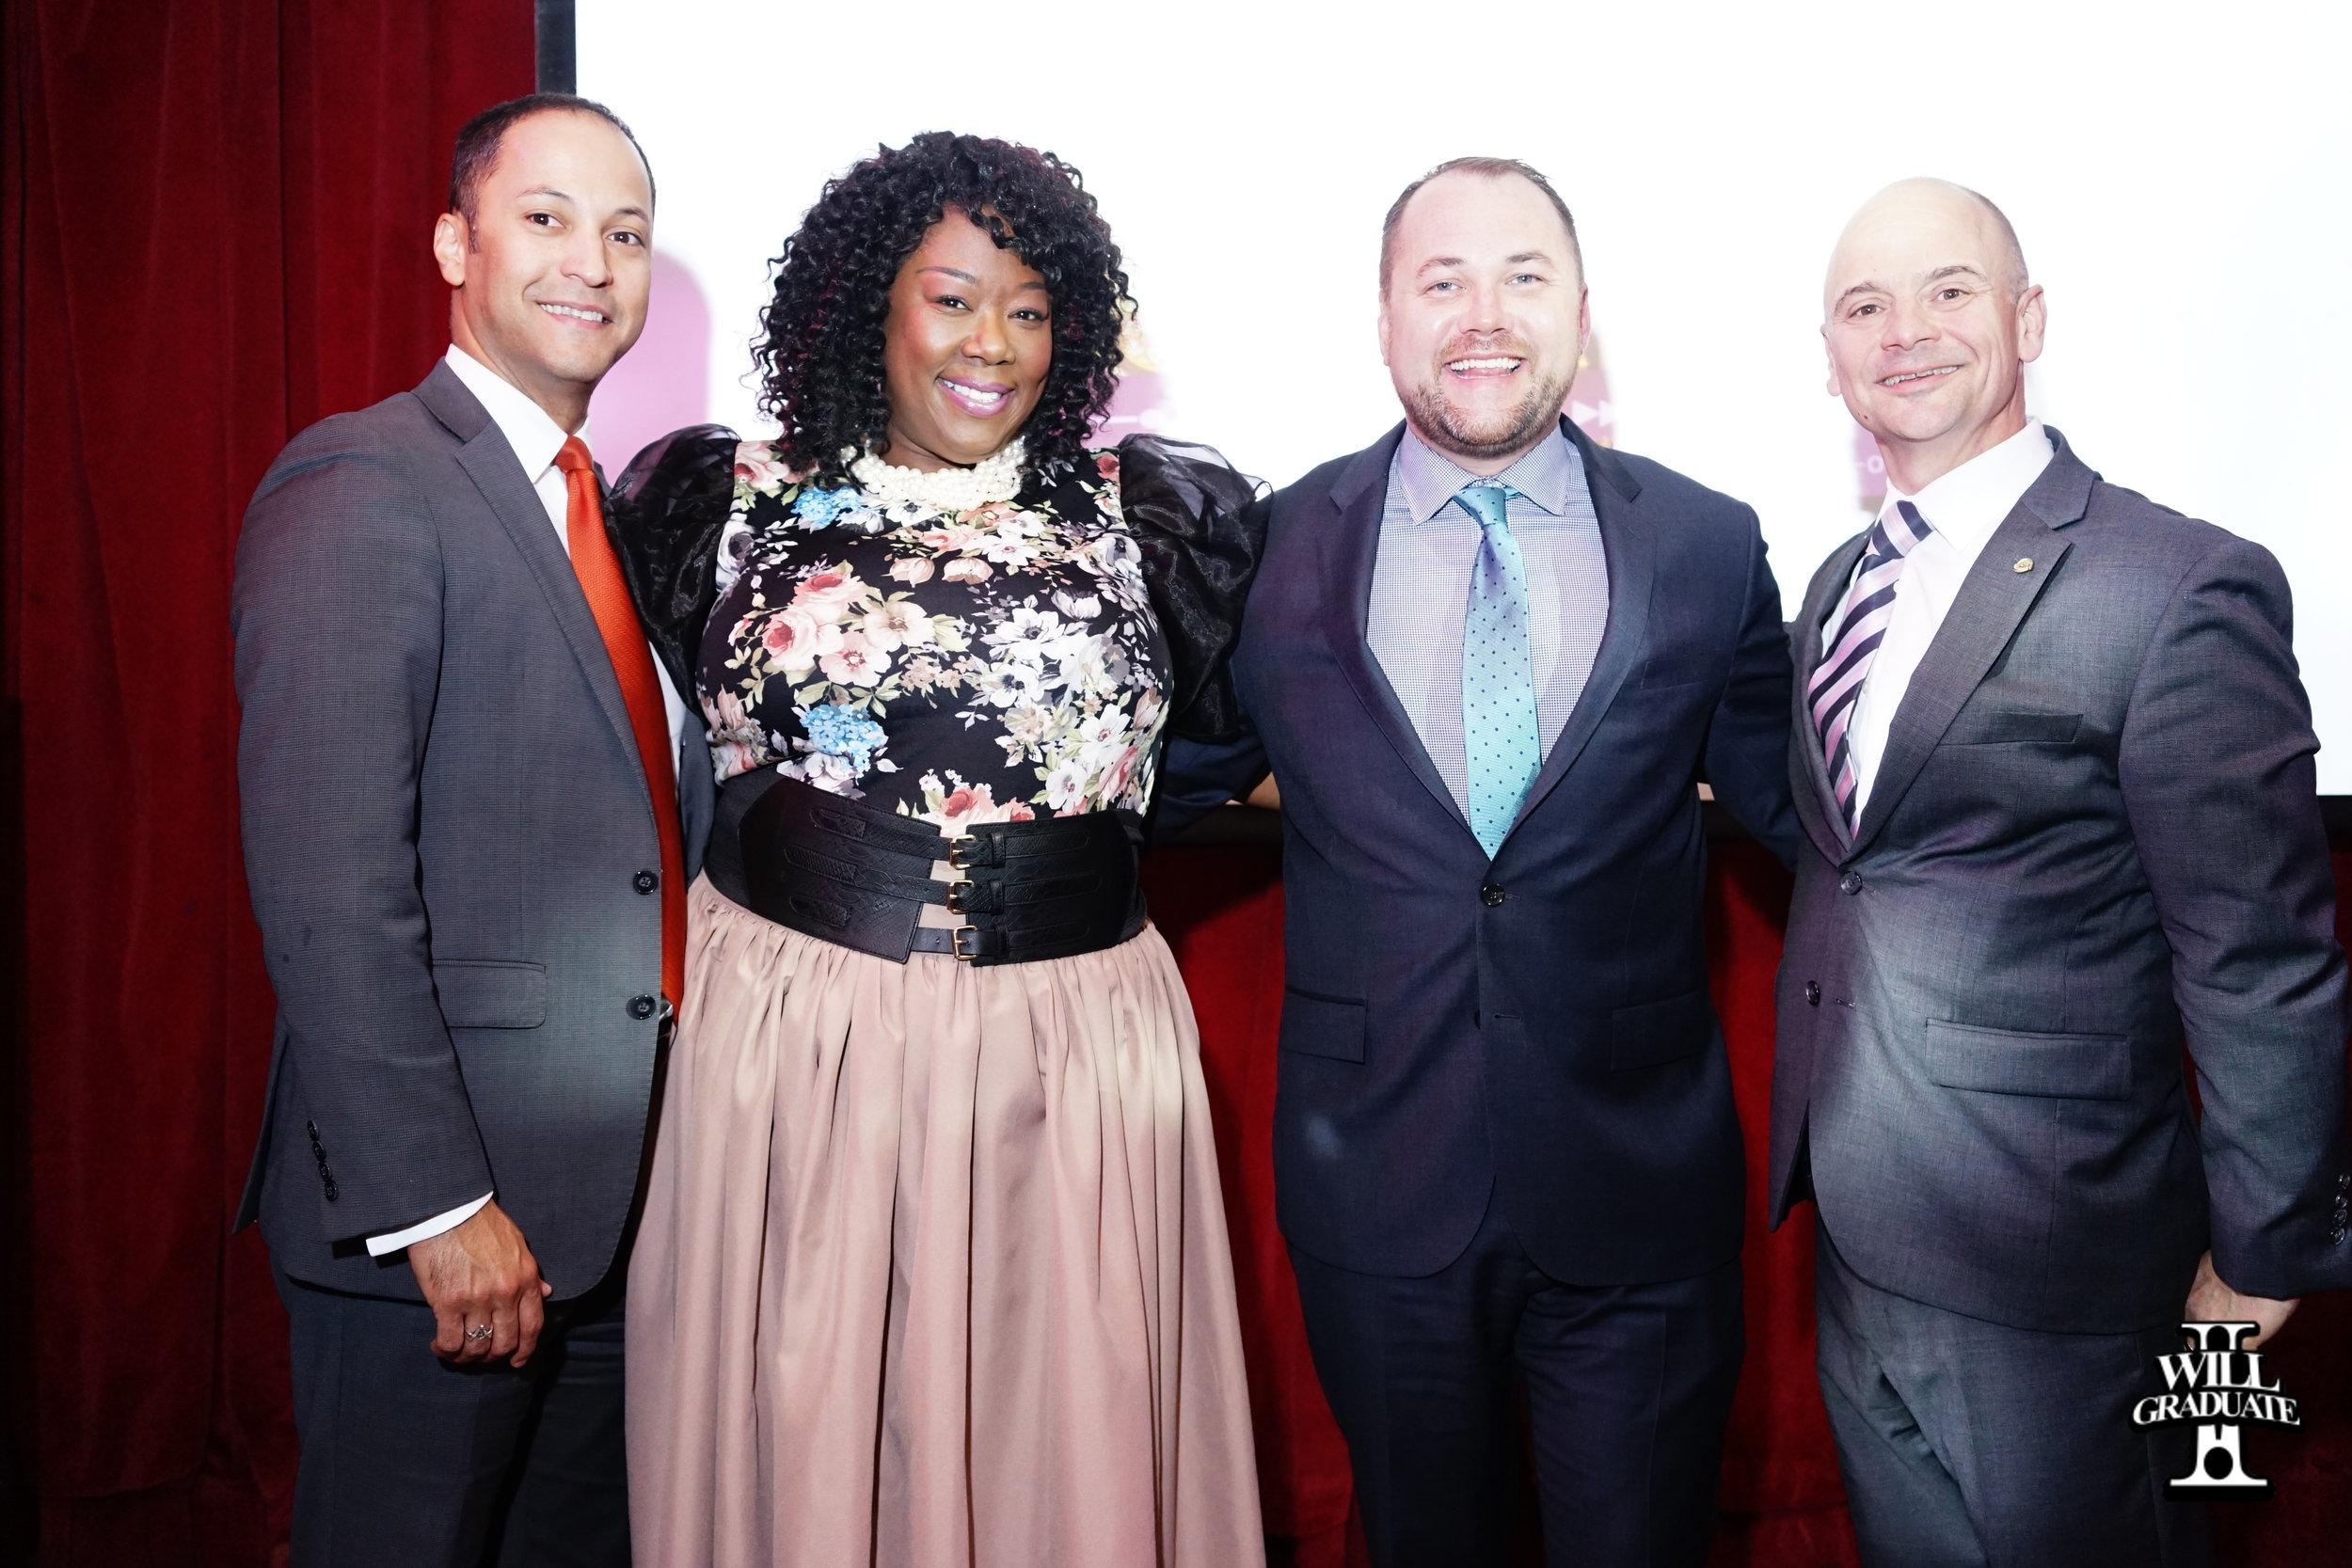 Left to Right: Henry Rubio (VP of CSA), David Vazquez (Principal Honoree), Tõnya Lewis Taylor (E4EA), Corey Johnson ( Speaker of New York City Council) and Mark Cannizzaro (CSA)